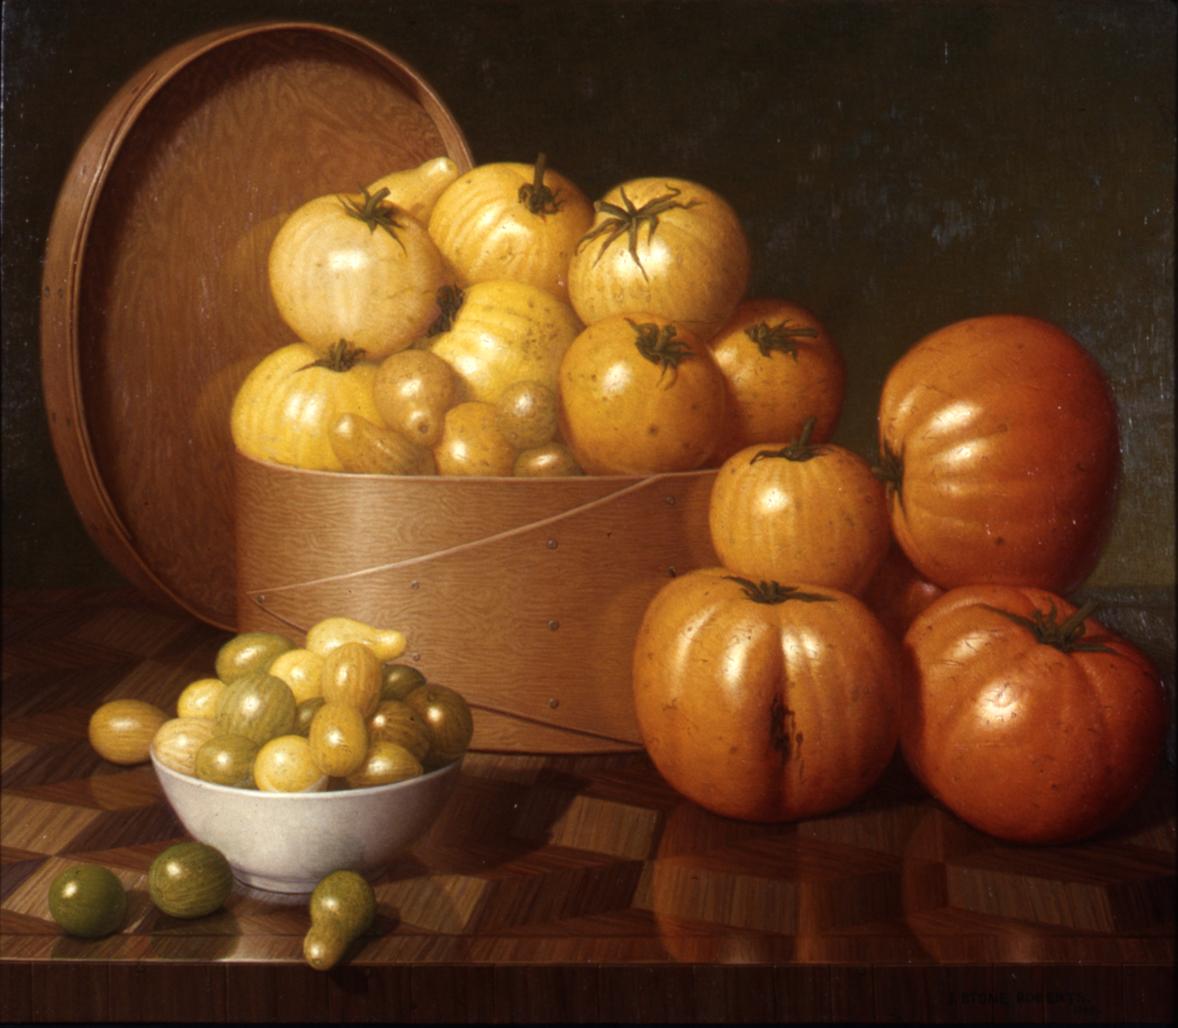 YELLOW TOMATOES (1987/88)